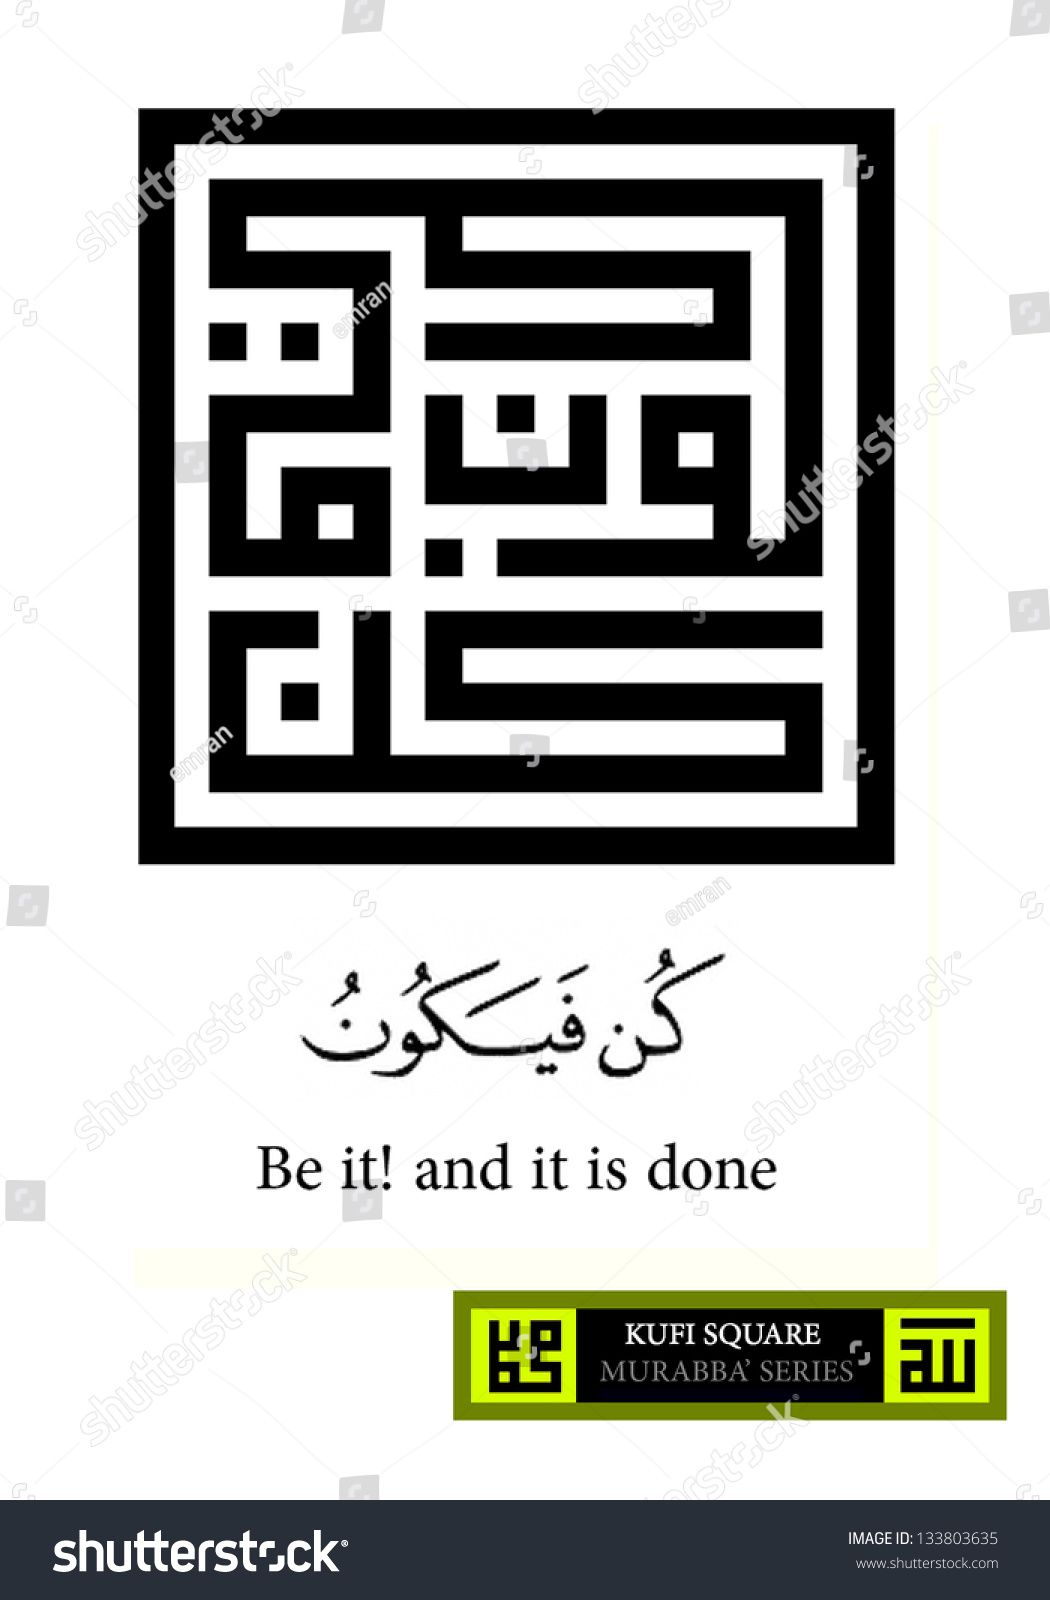 Bn Ayat Kufi Frame Wall Decor Islam Calligraphy Zikir Furniture Home Decor Di Carousell Seni Kaligrafi Seni Kaligrafi Arab Kaligrafi Islam